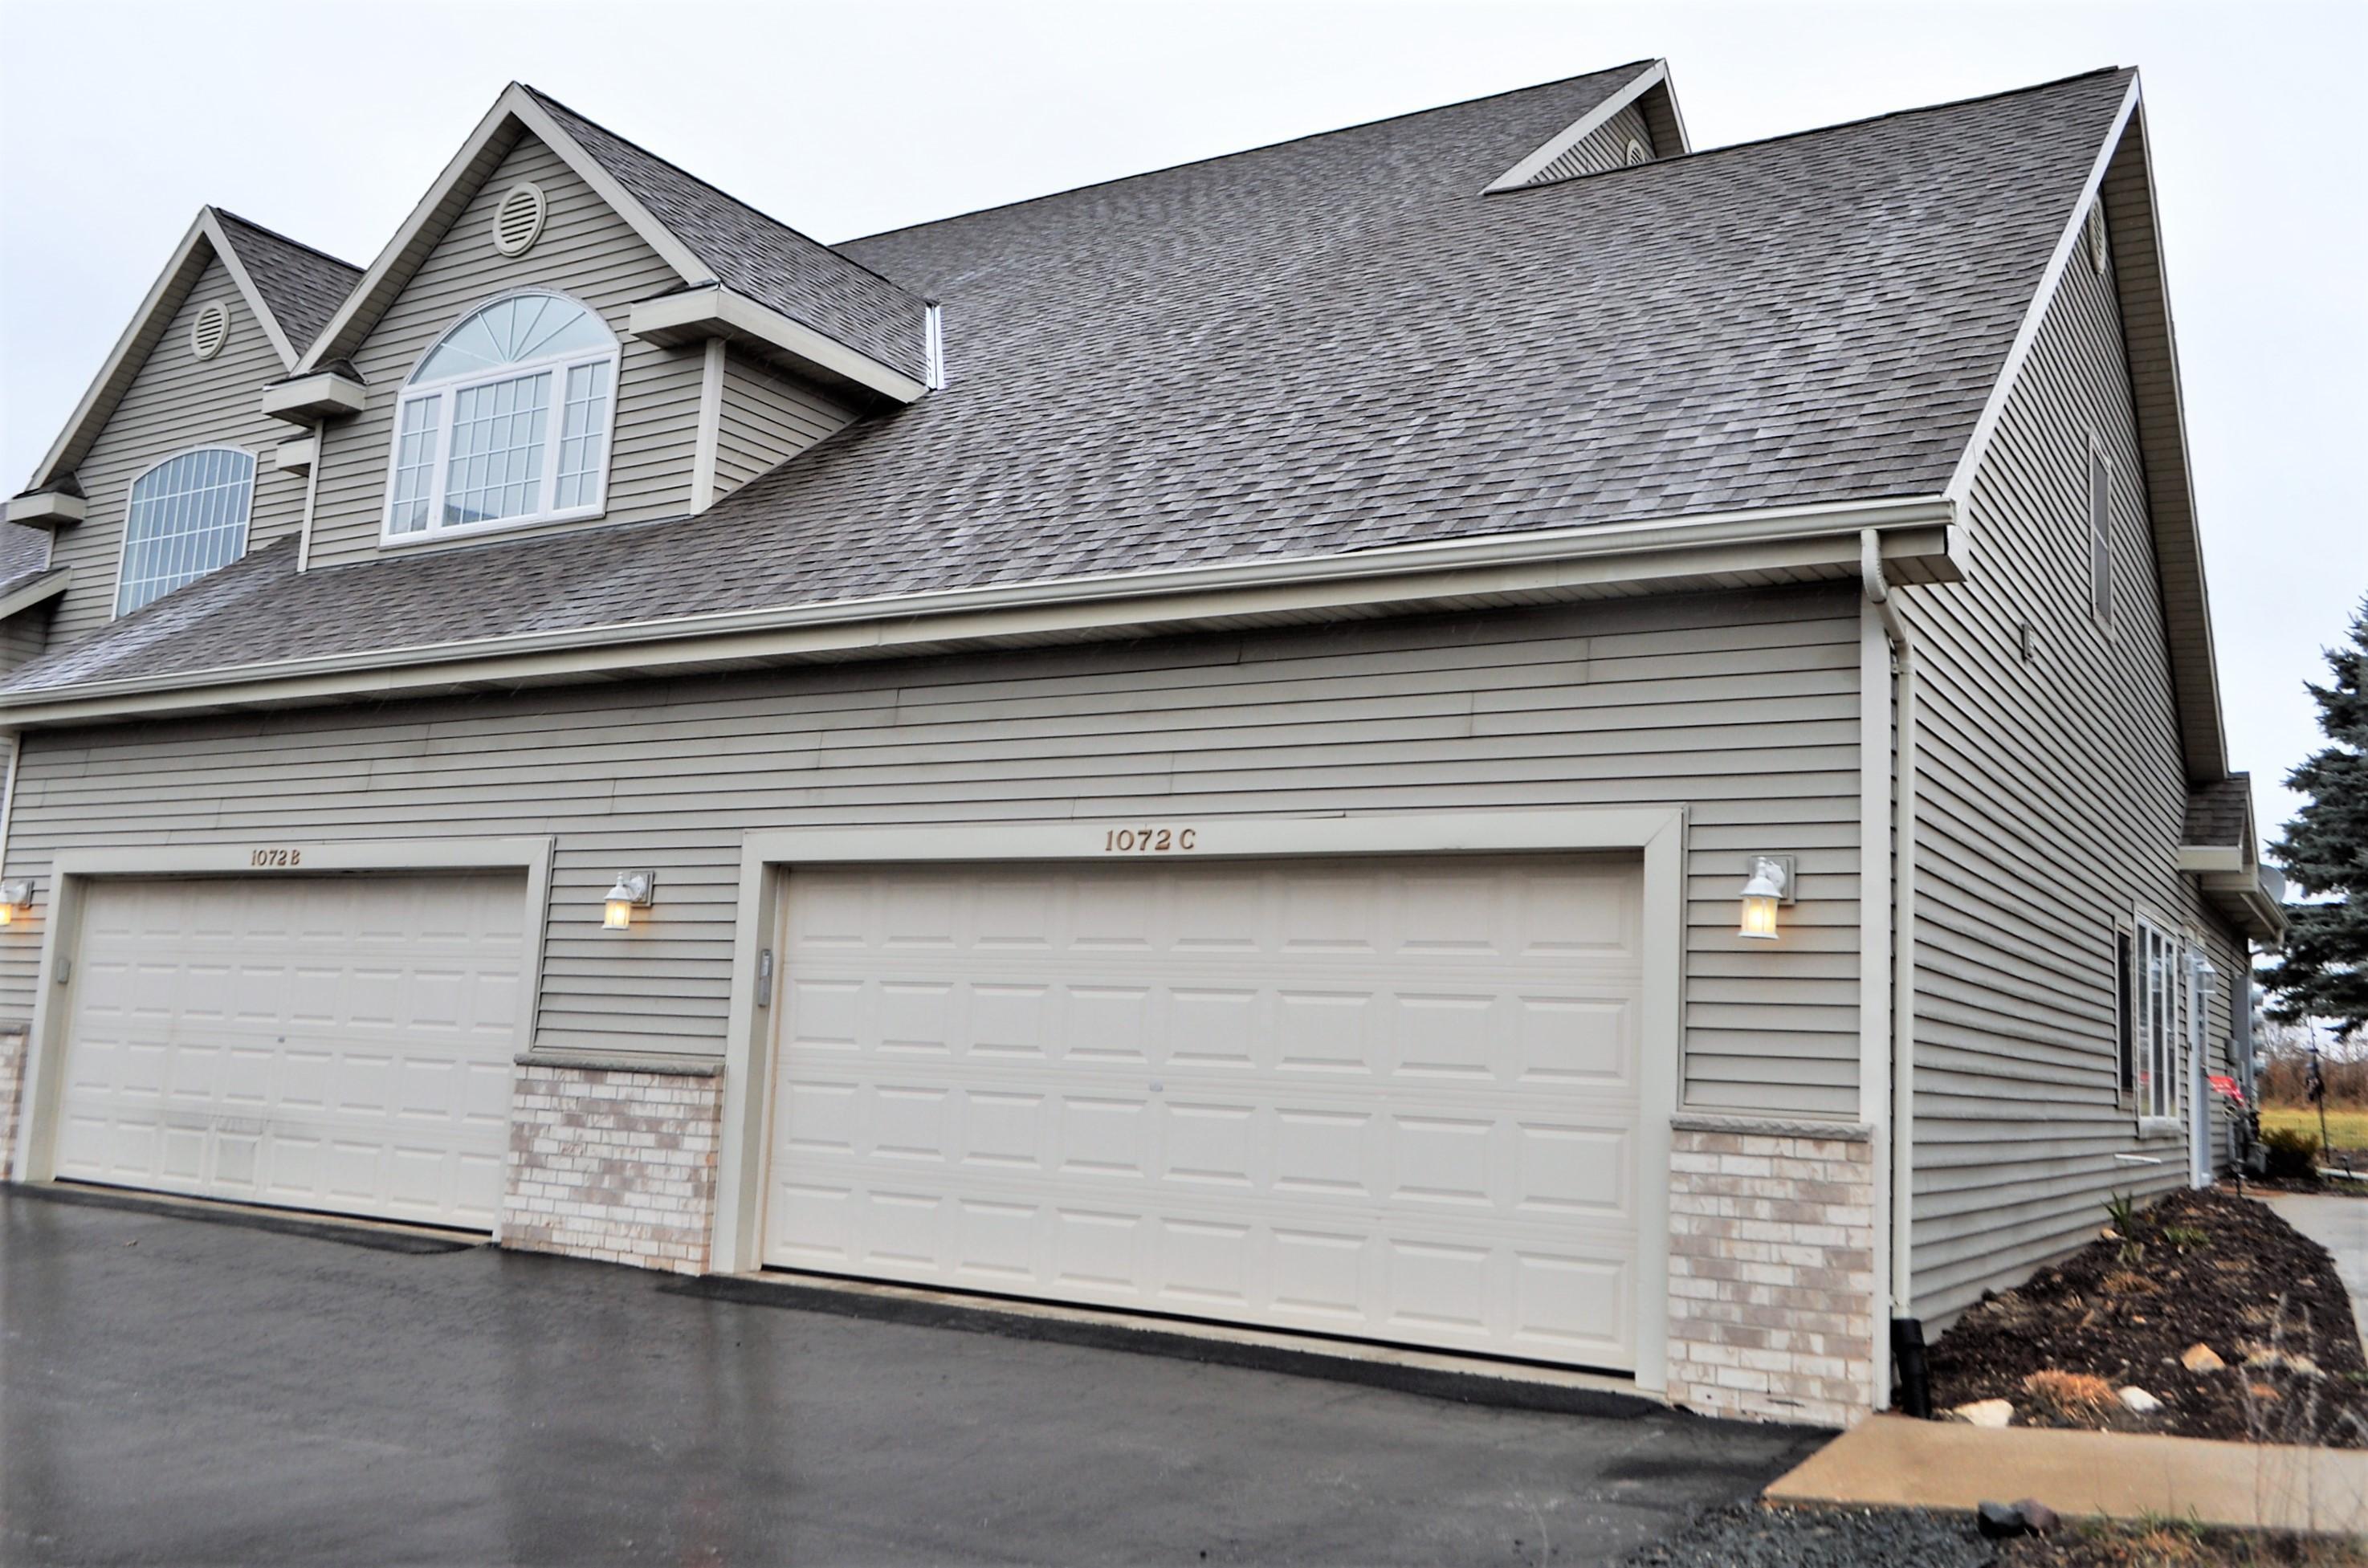 1072 Quinlan Dr, Pewaukee, Wisconsin 53072, 2 Bedrooms Bedrooms, 6 Rooms Rooms,2 BathroomsBathrooms,Condominiums,For Sale,Quinlan Dr,1,1721236